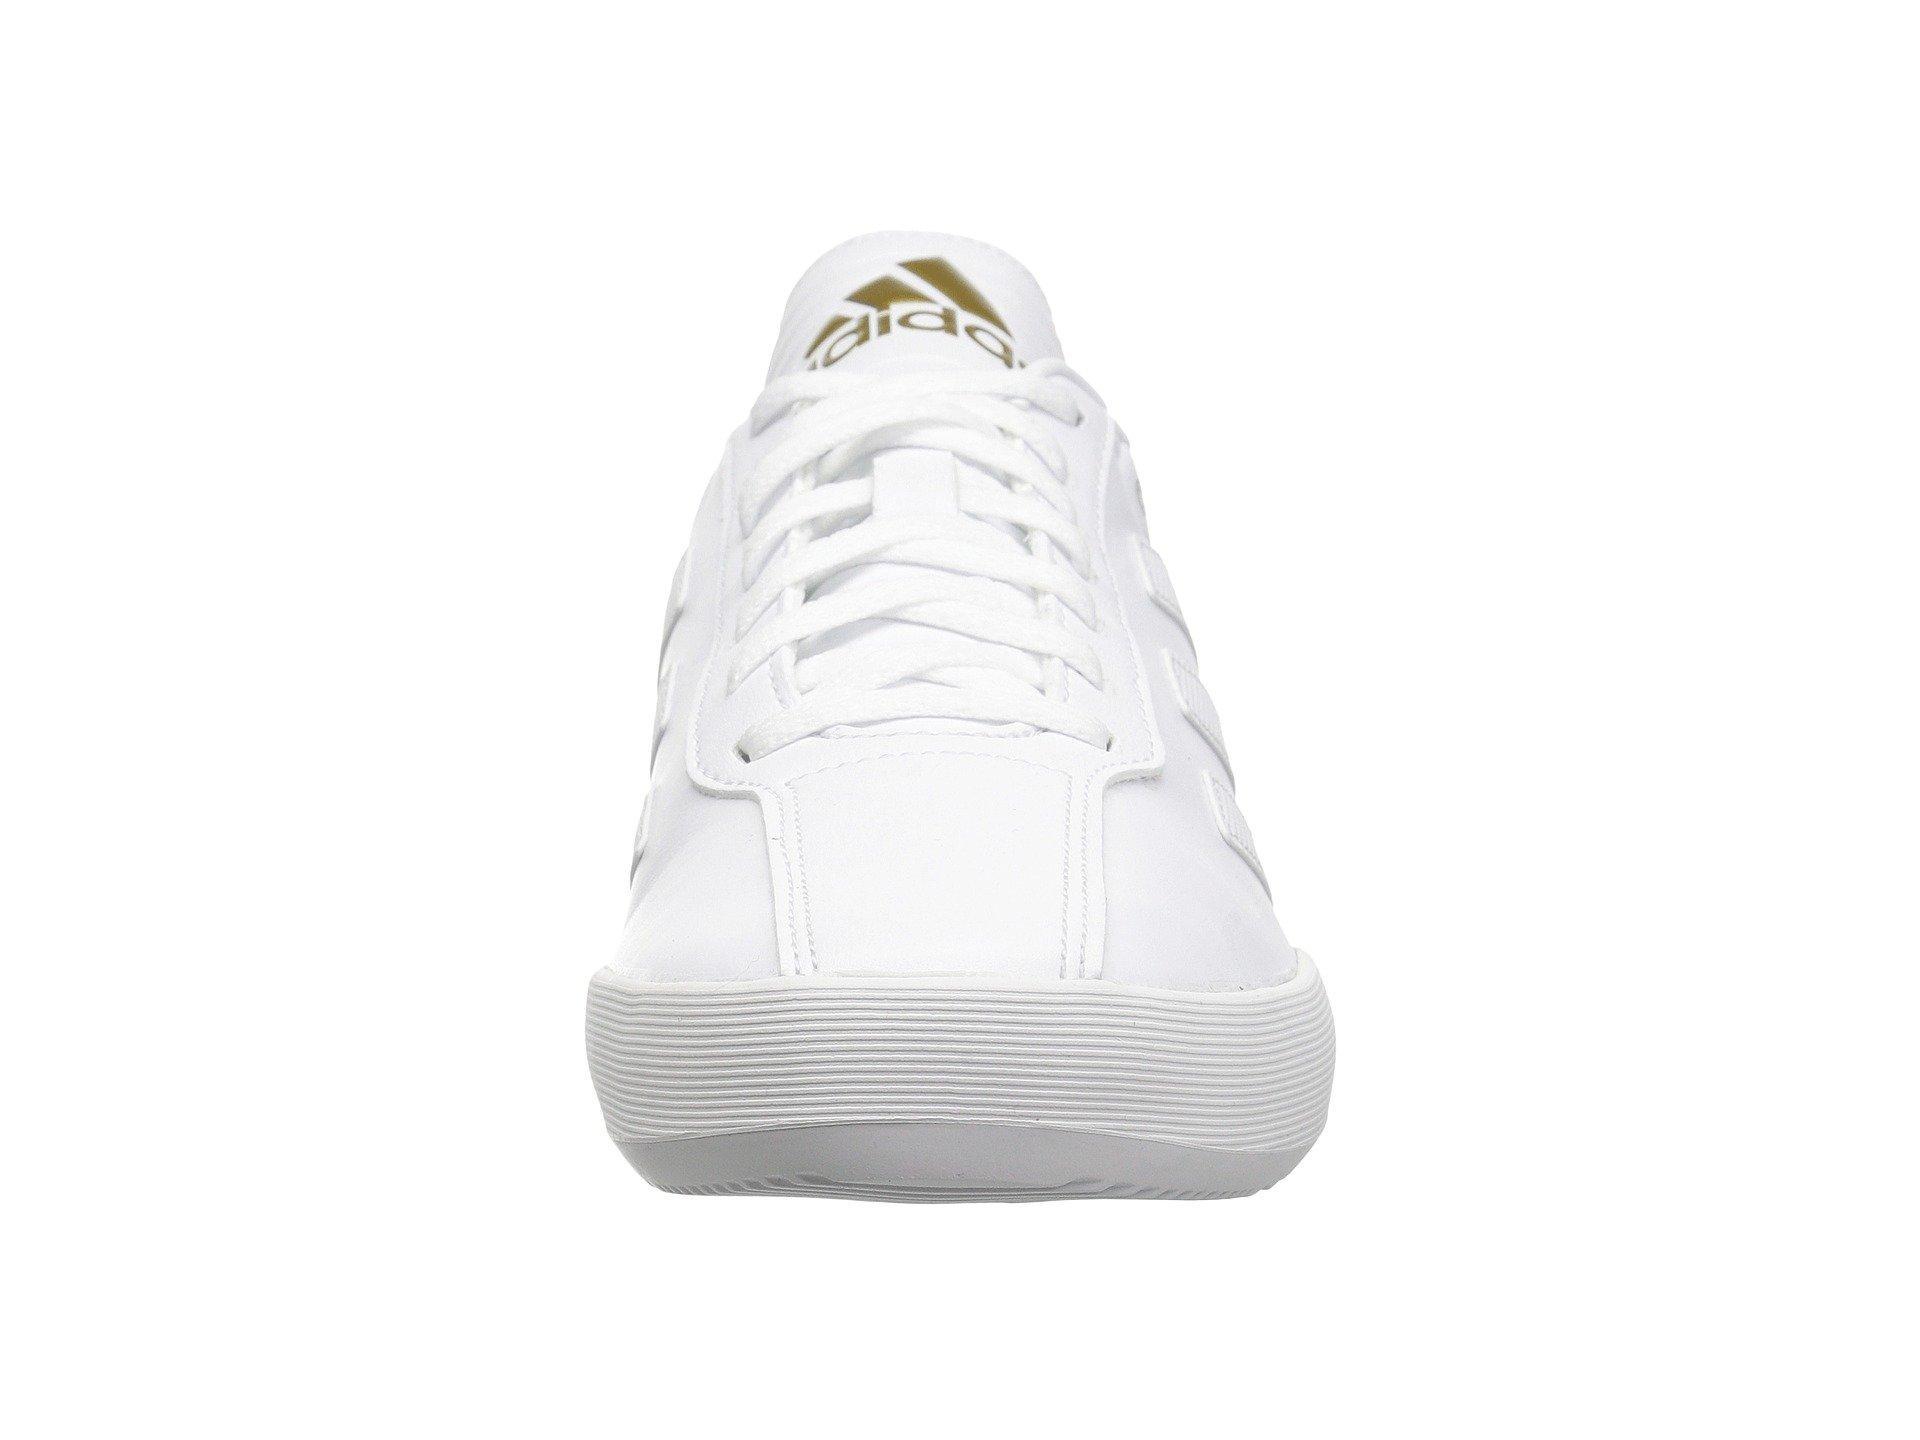 innovative design 4d8f7 2775e Adidas - White Copa Super for Men - Lyst. View fullscreen